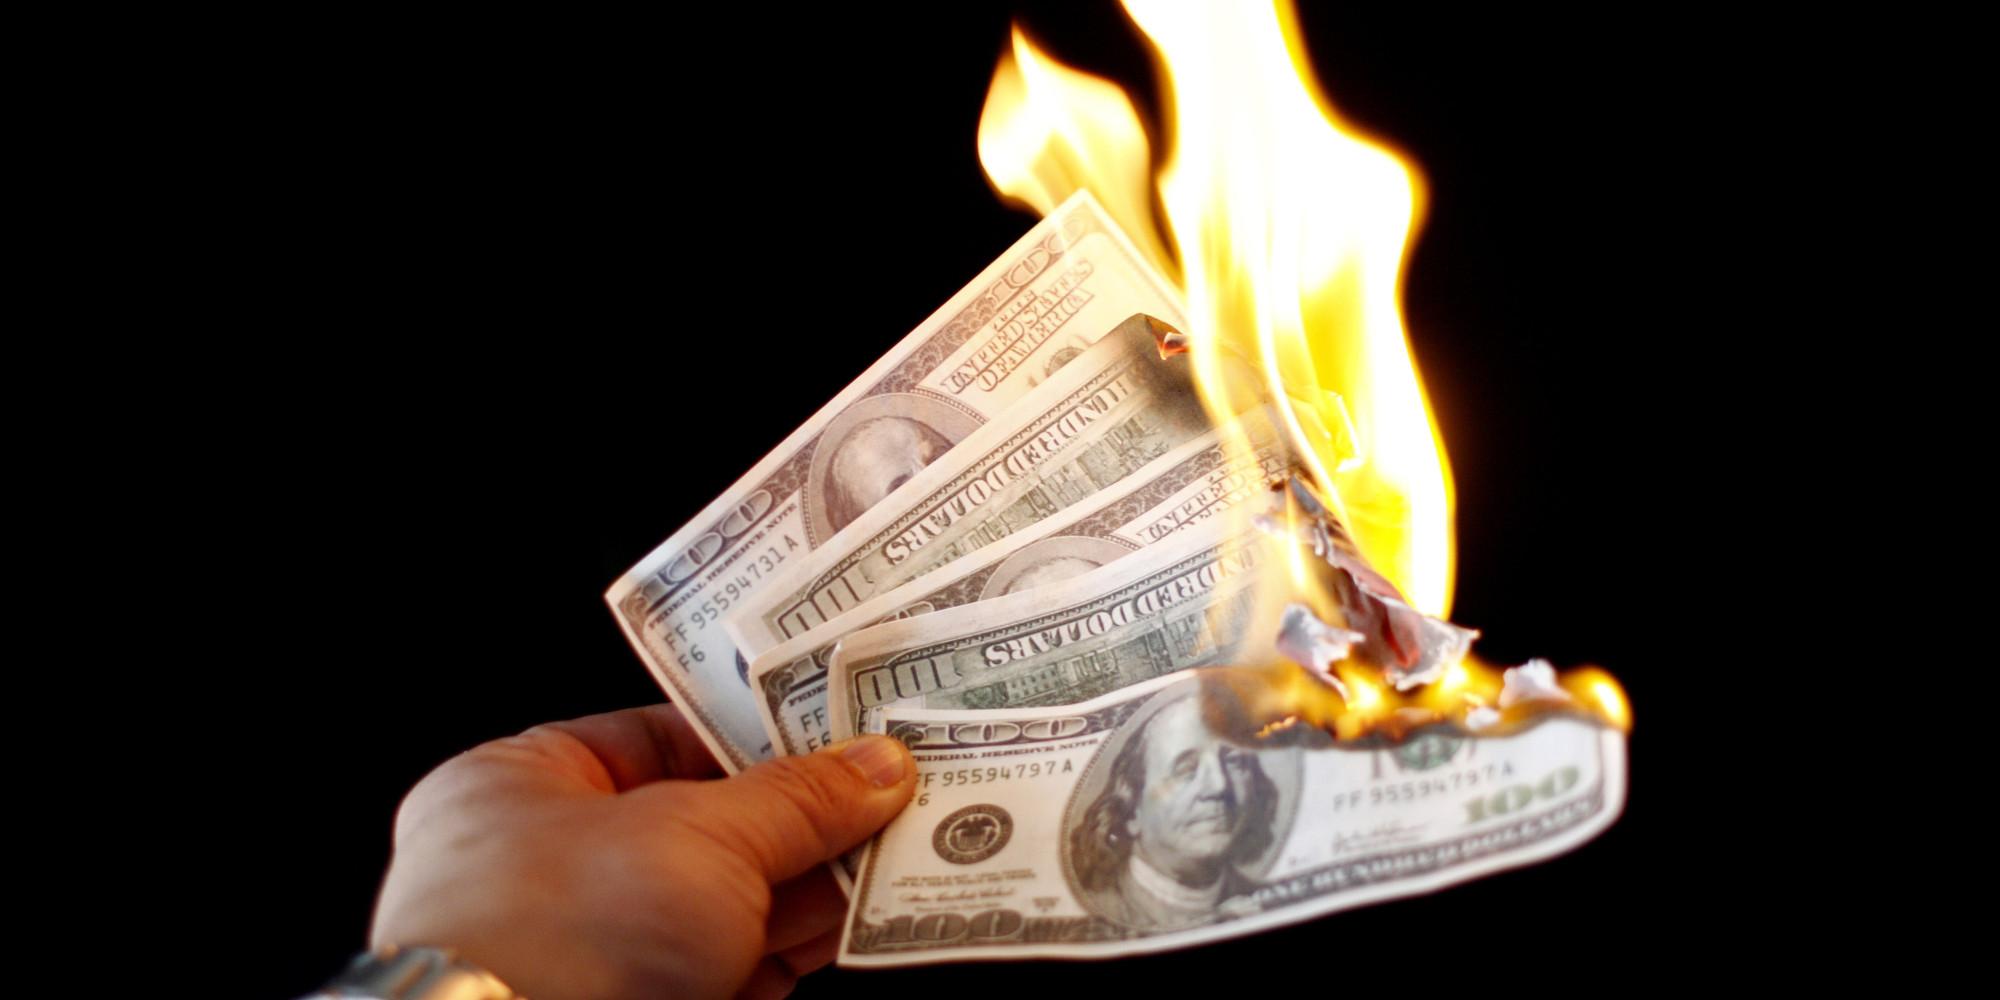 o-BURNING-MONEYHJJJJJJJJJJJJYKJJJJJJJJJJJJJJJJJJJJJJ-facebook.jpg